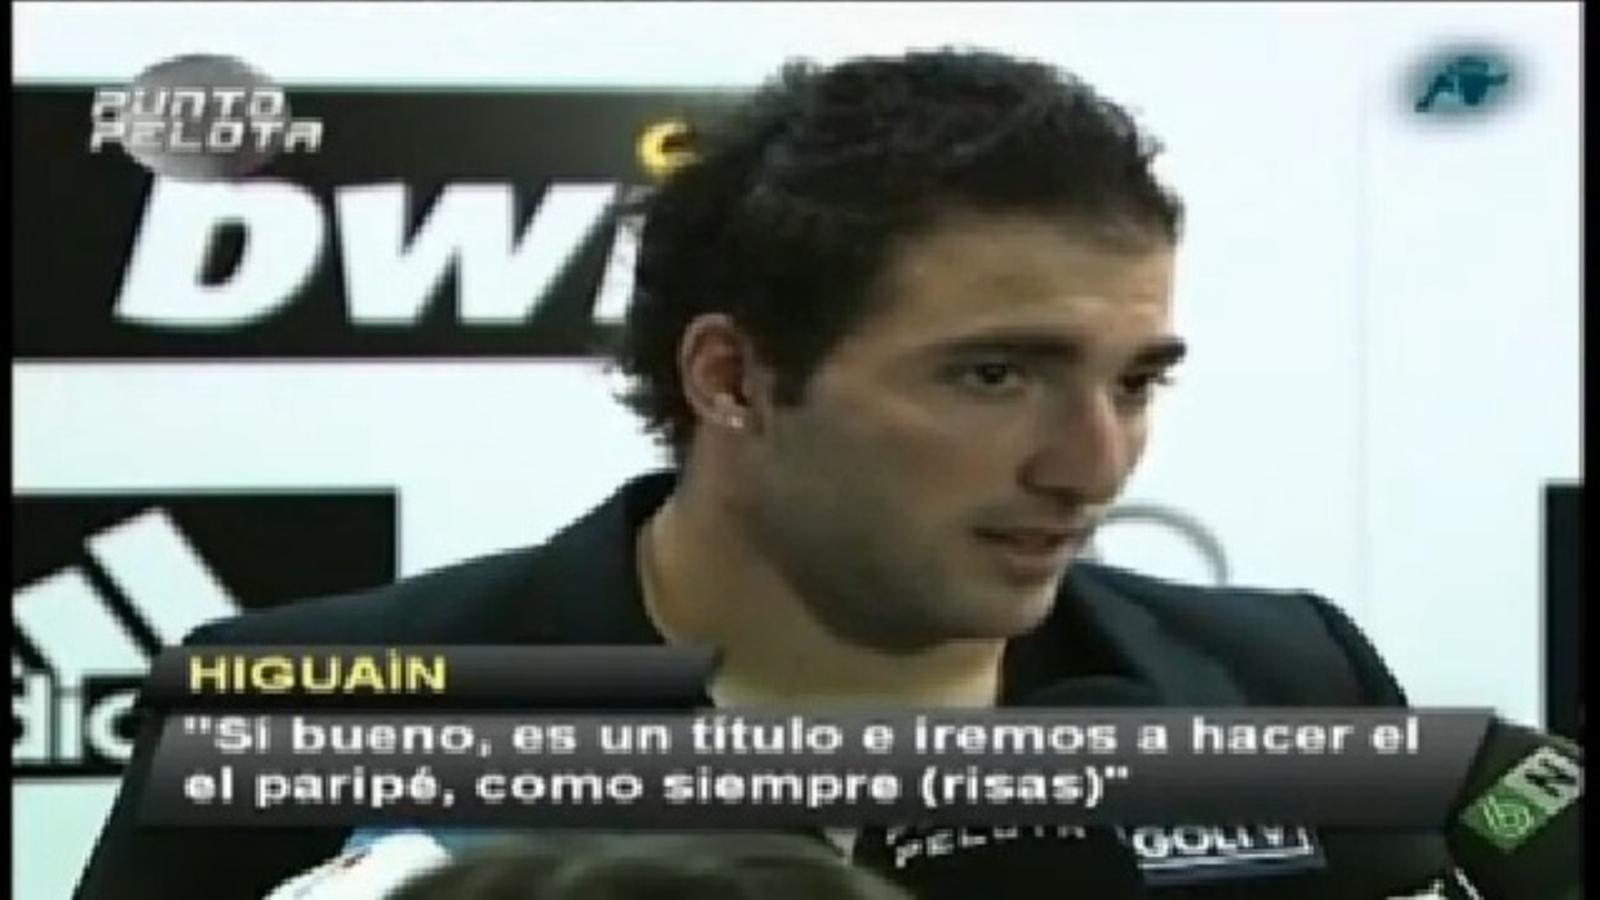 Higuaín qualifica de paripé la celebració de Copa del Rei